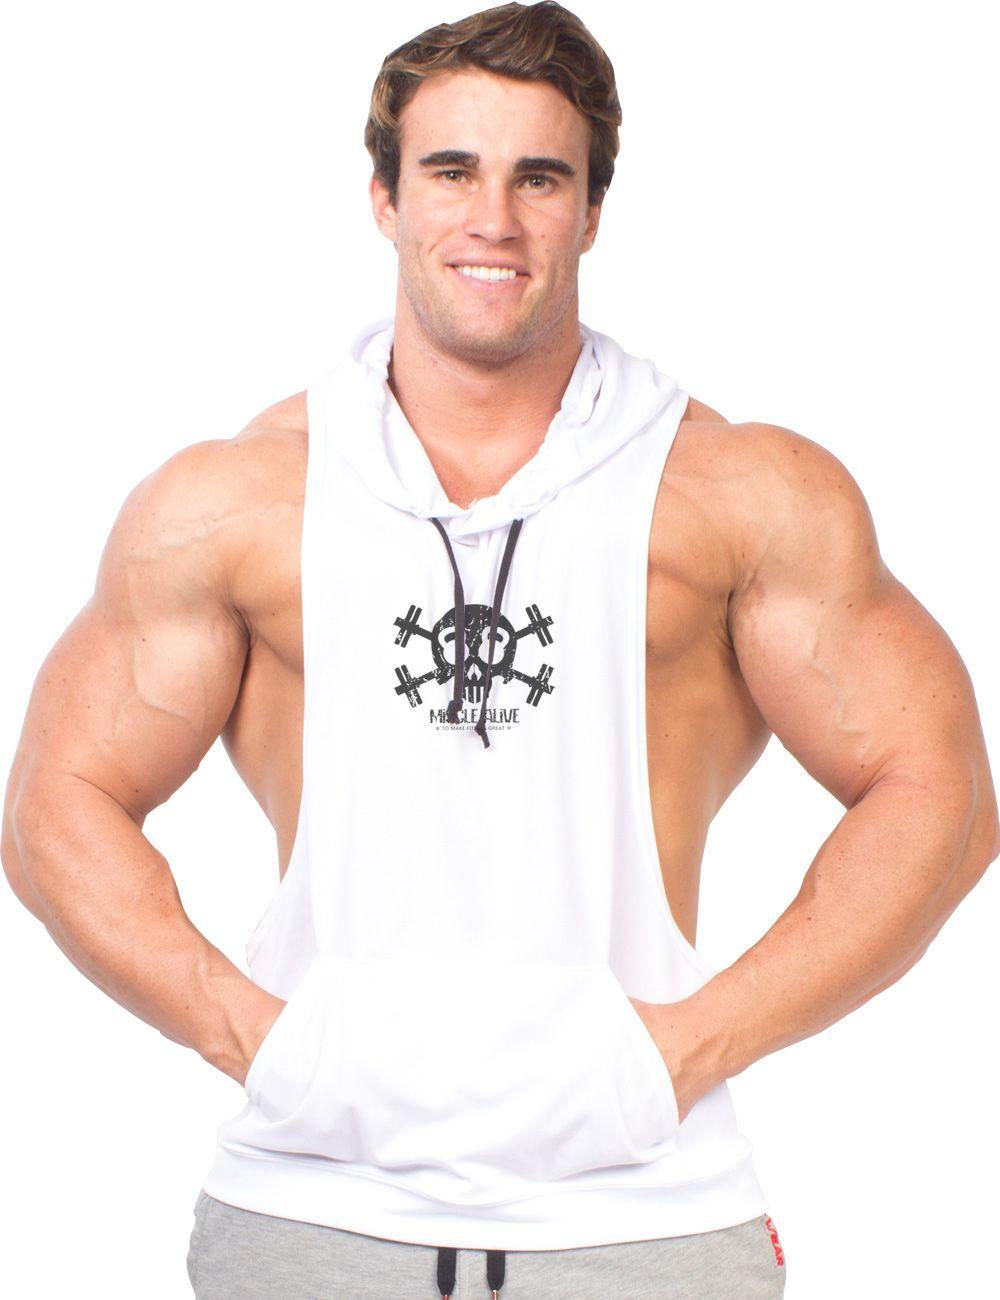 Click to buy ucuc sportswear bodybuilding stringer sleeveless skull